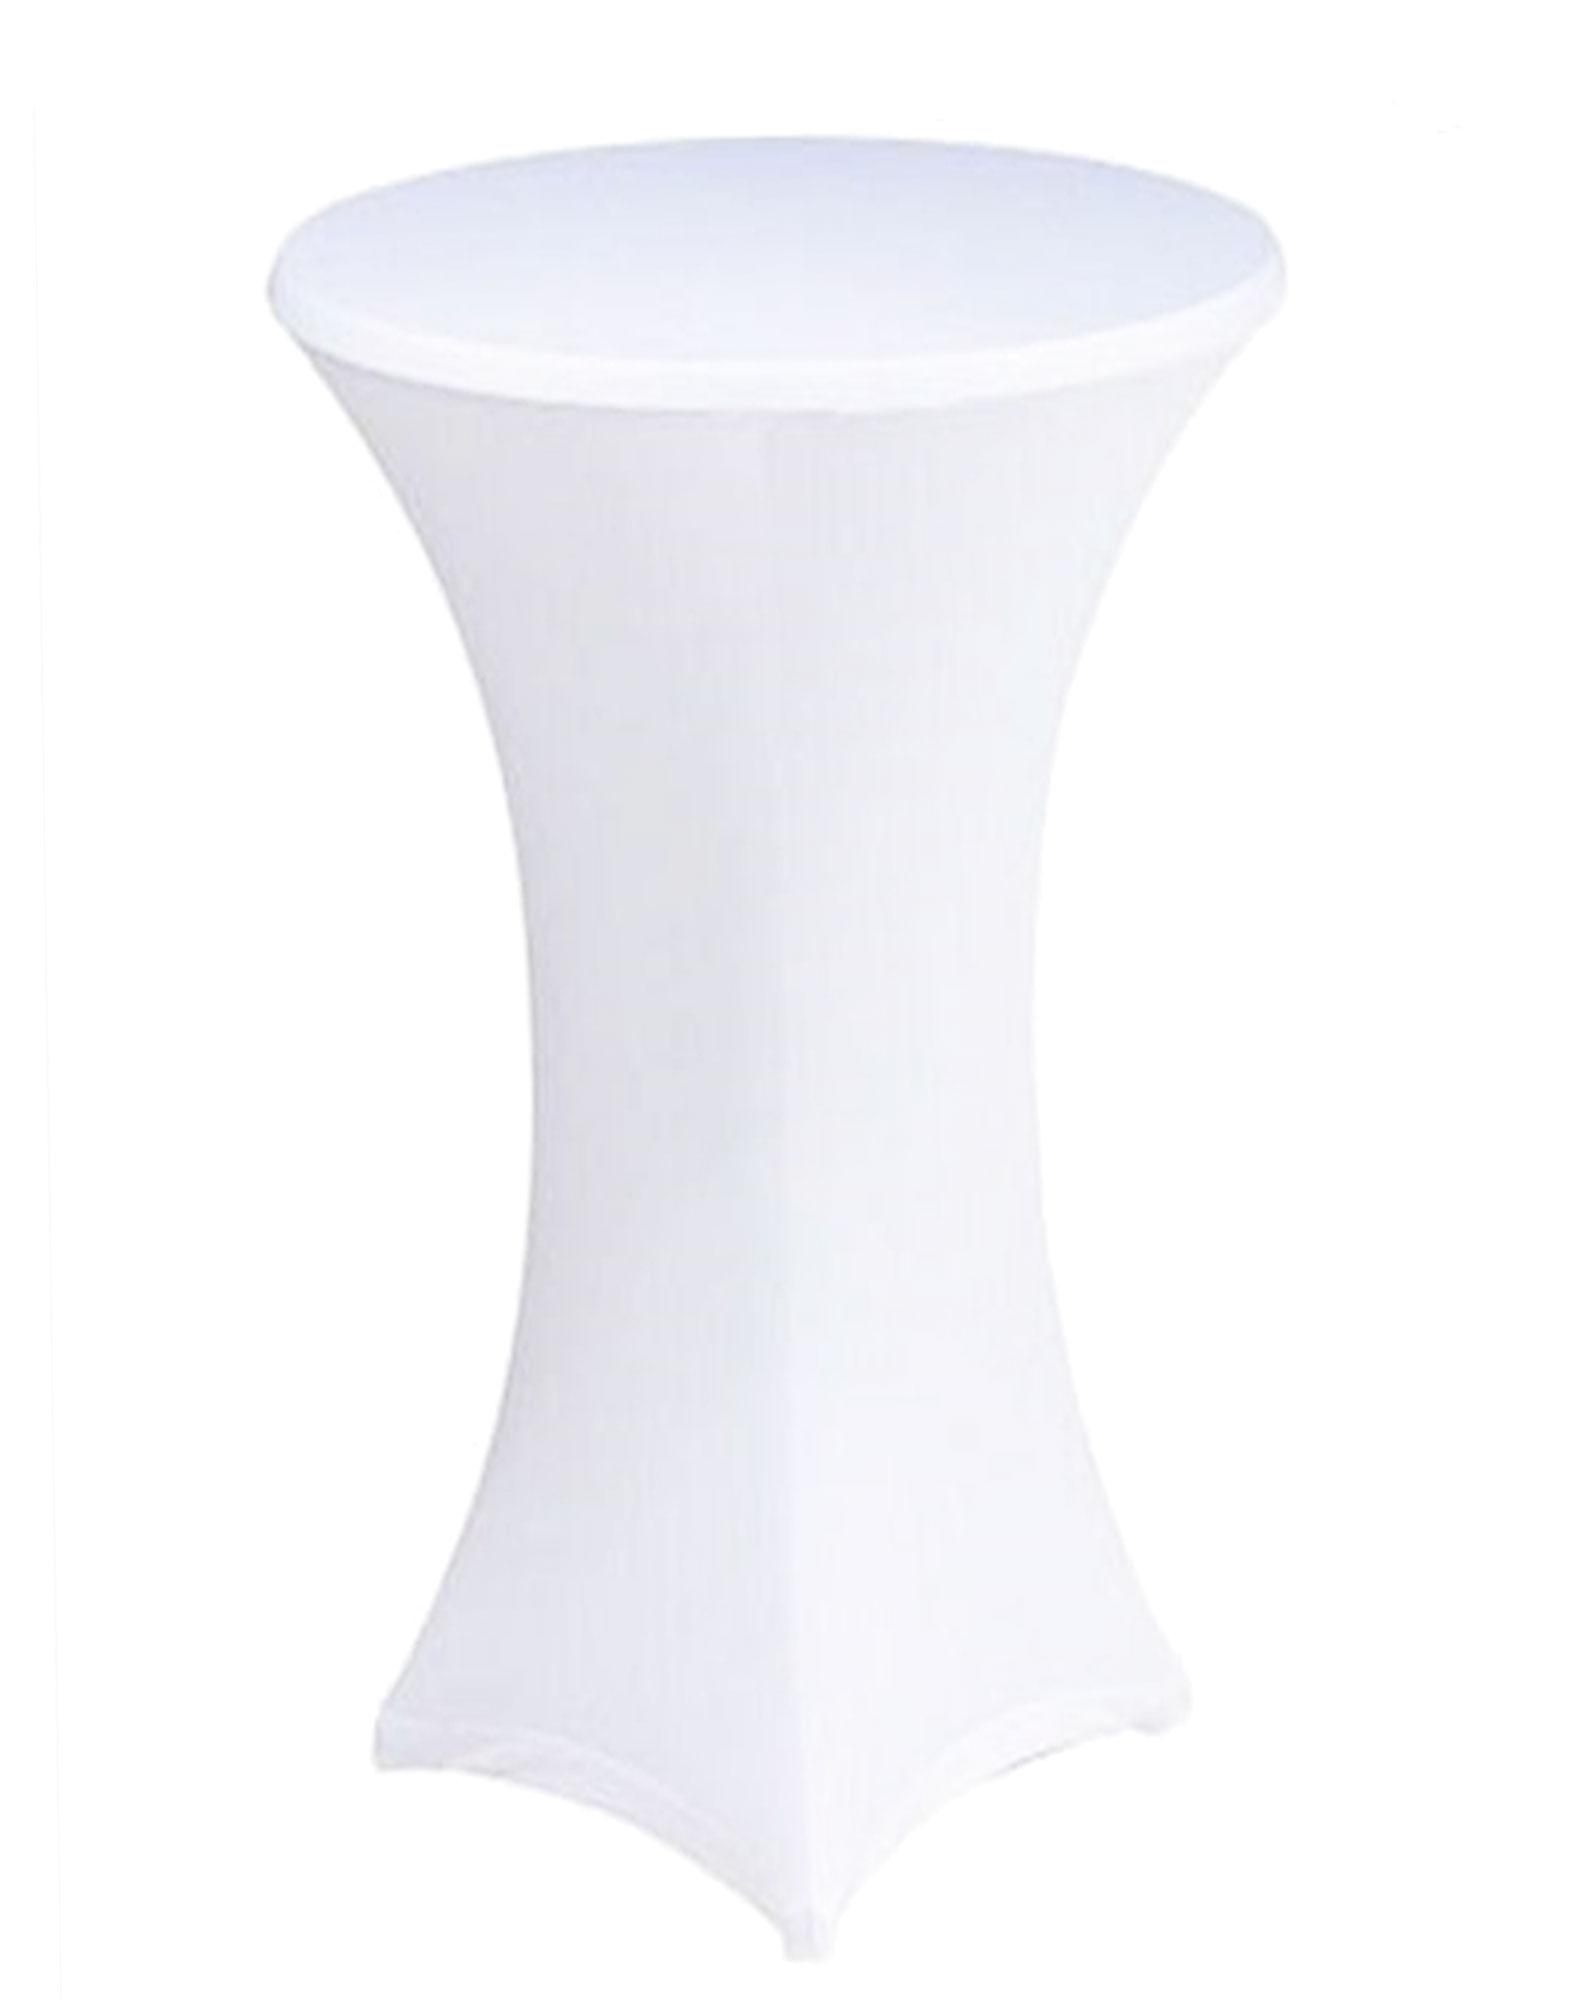 NAPPE BLANCHE POUR TABLE COCKTAIL